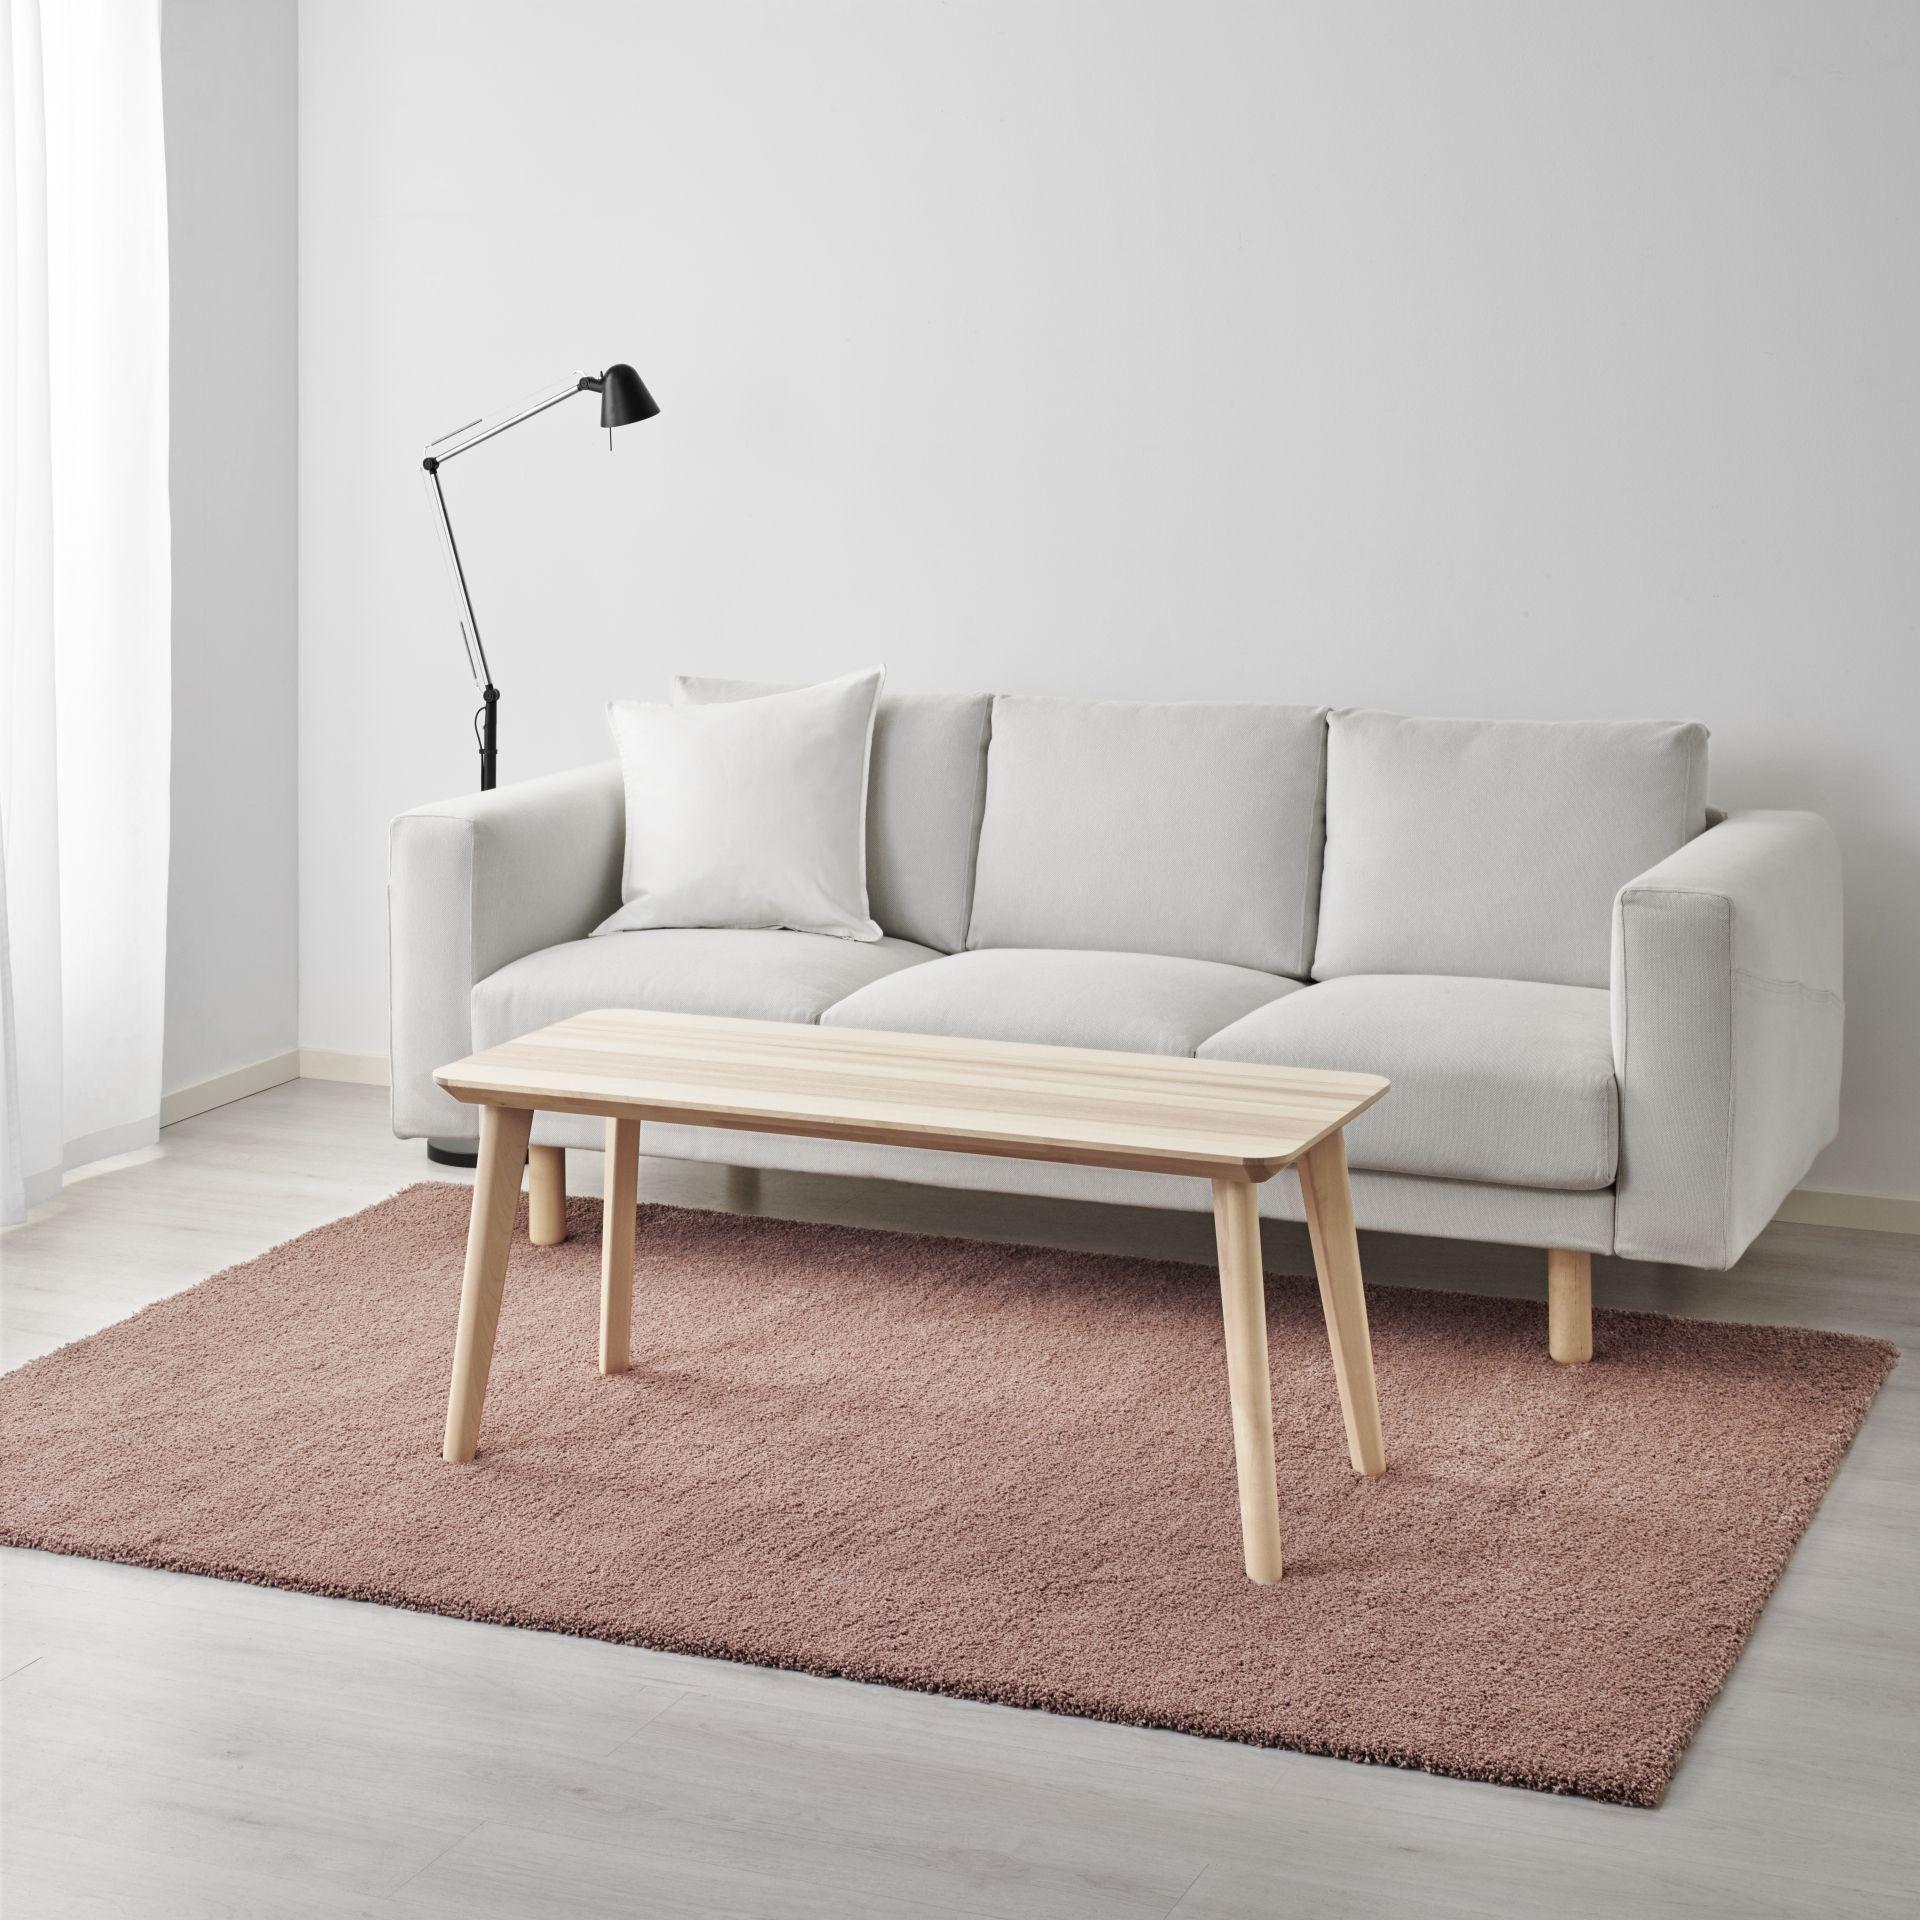 ÅDUM Vloerkleed, hoogpolig, oudroze | Dorm room, Dorm and Catalog